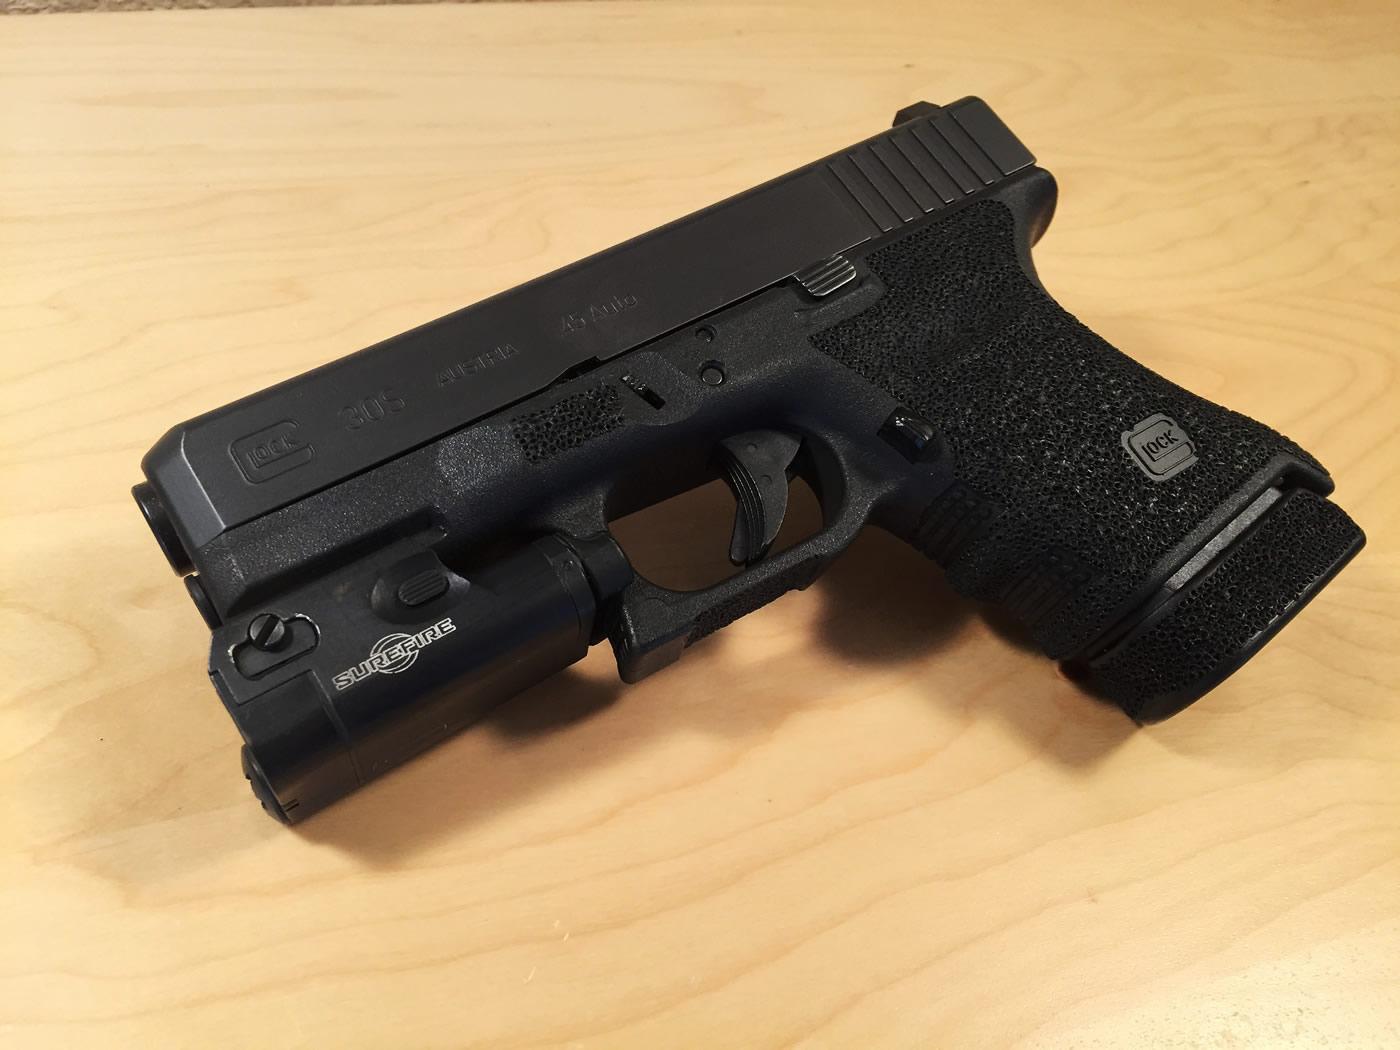 Shooting Review: The Glock 30S | Eagle Gun Range Inc